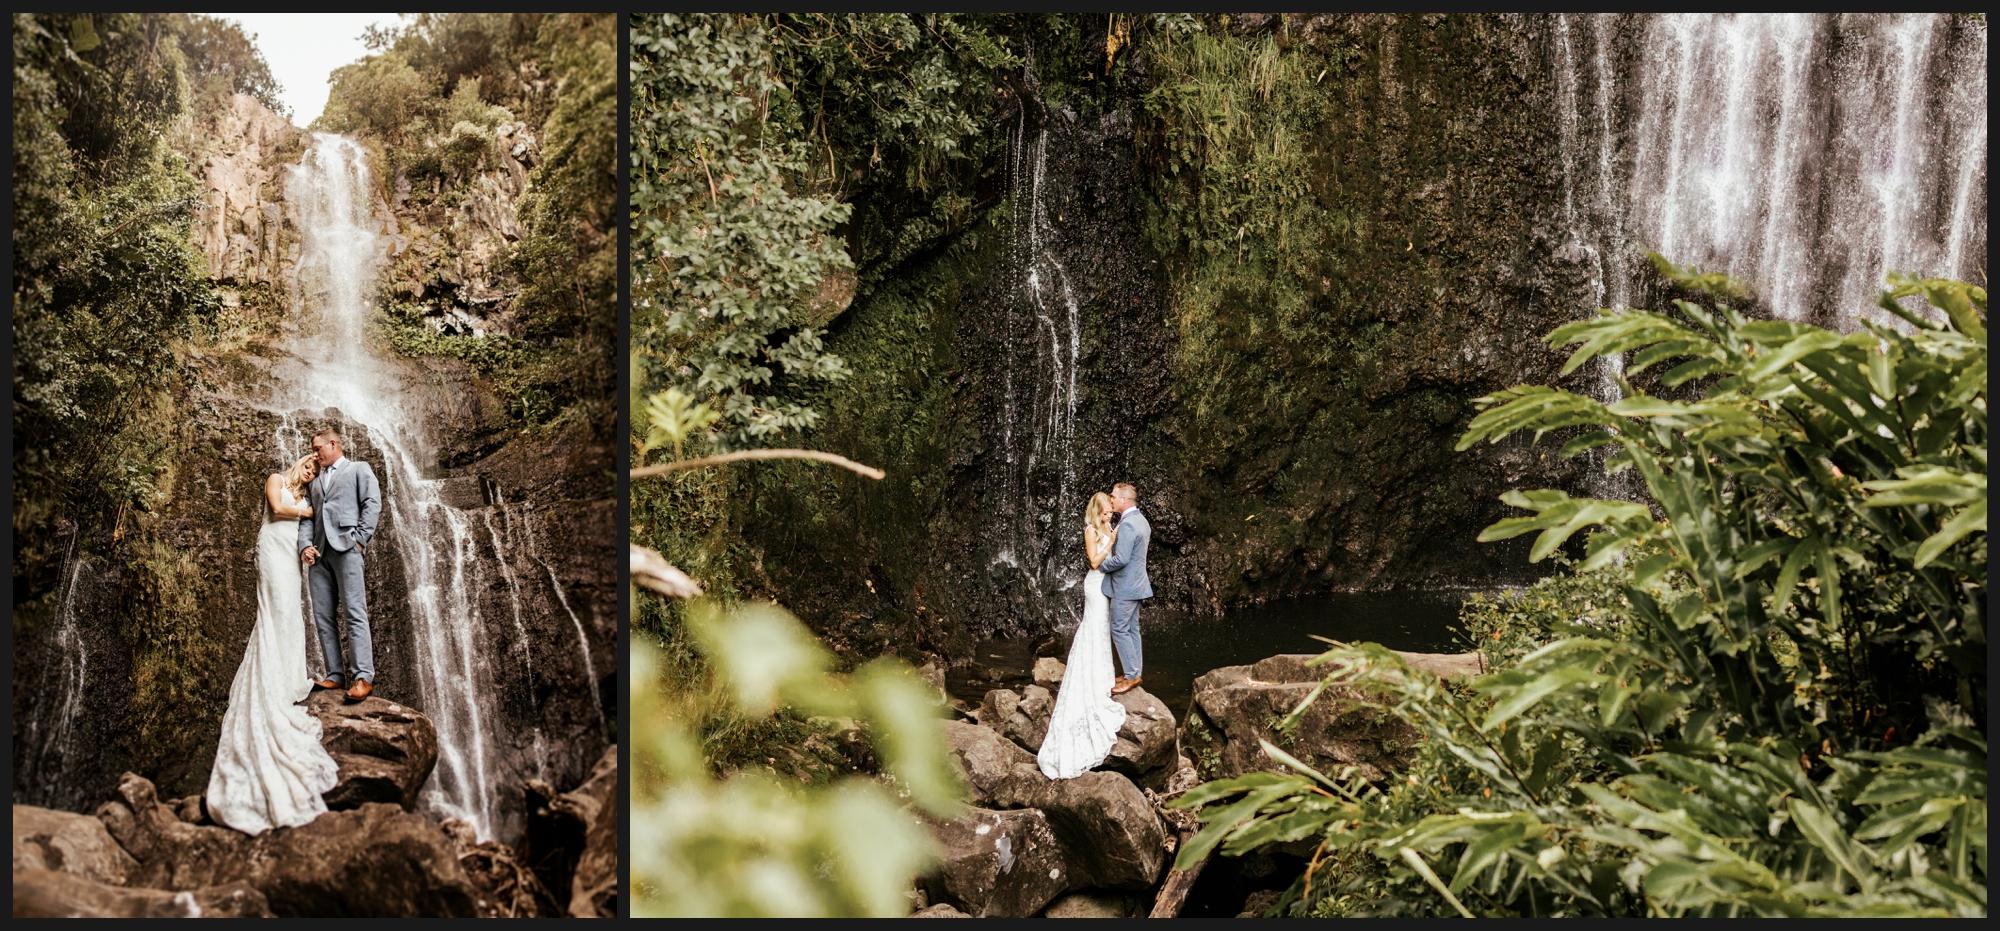 Orlando-Wedding-Photographer-destination-wedding-photographer-florida-wedding-photographer-hawaii-wedding-photographer_0001.jpg